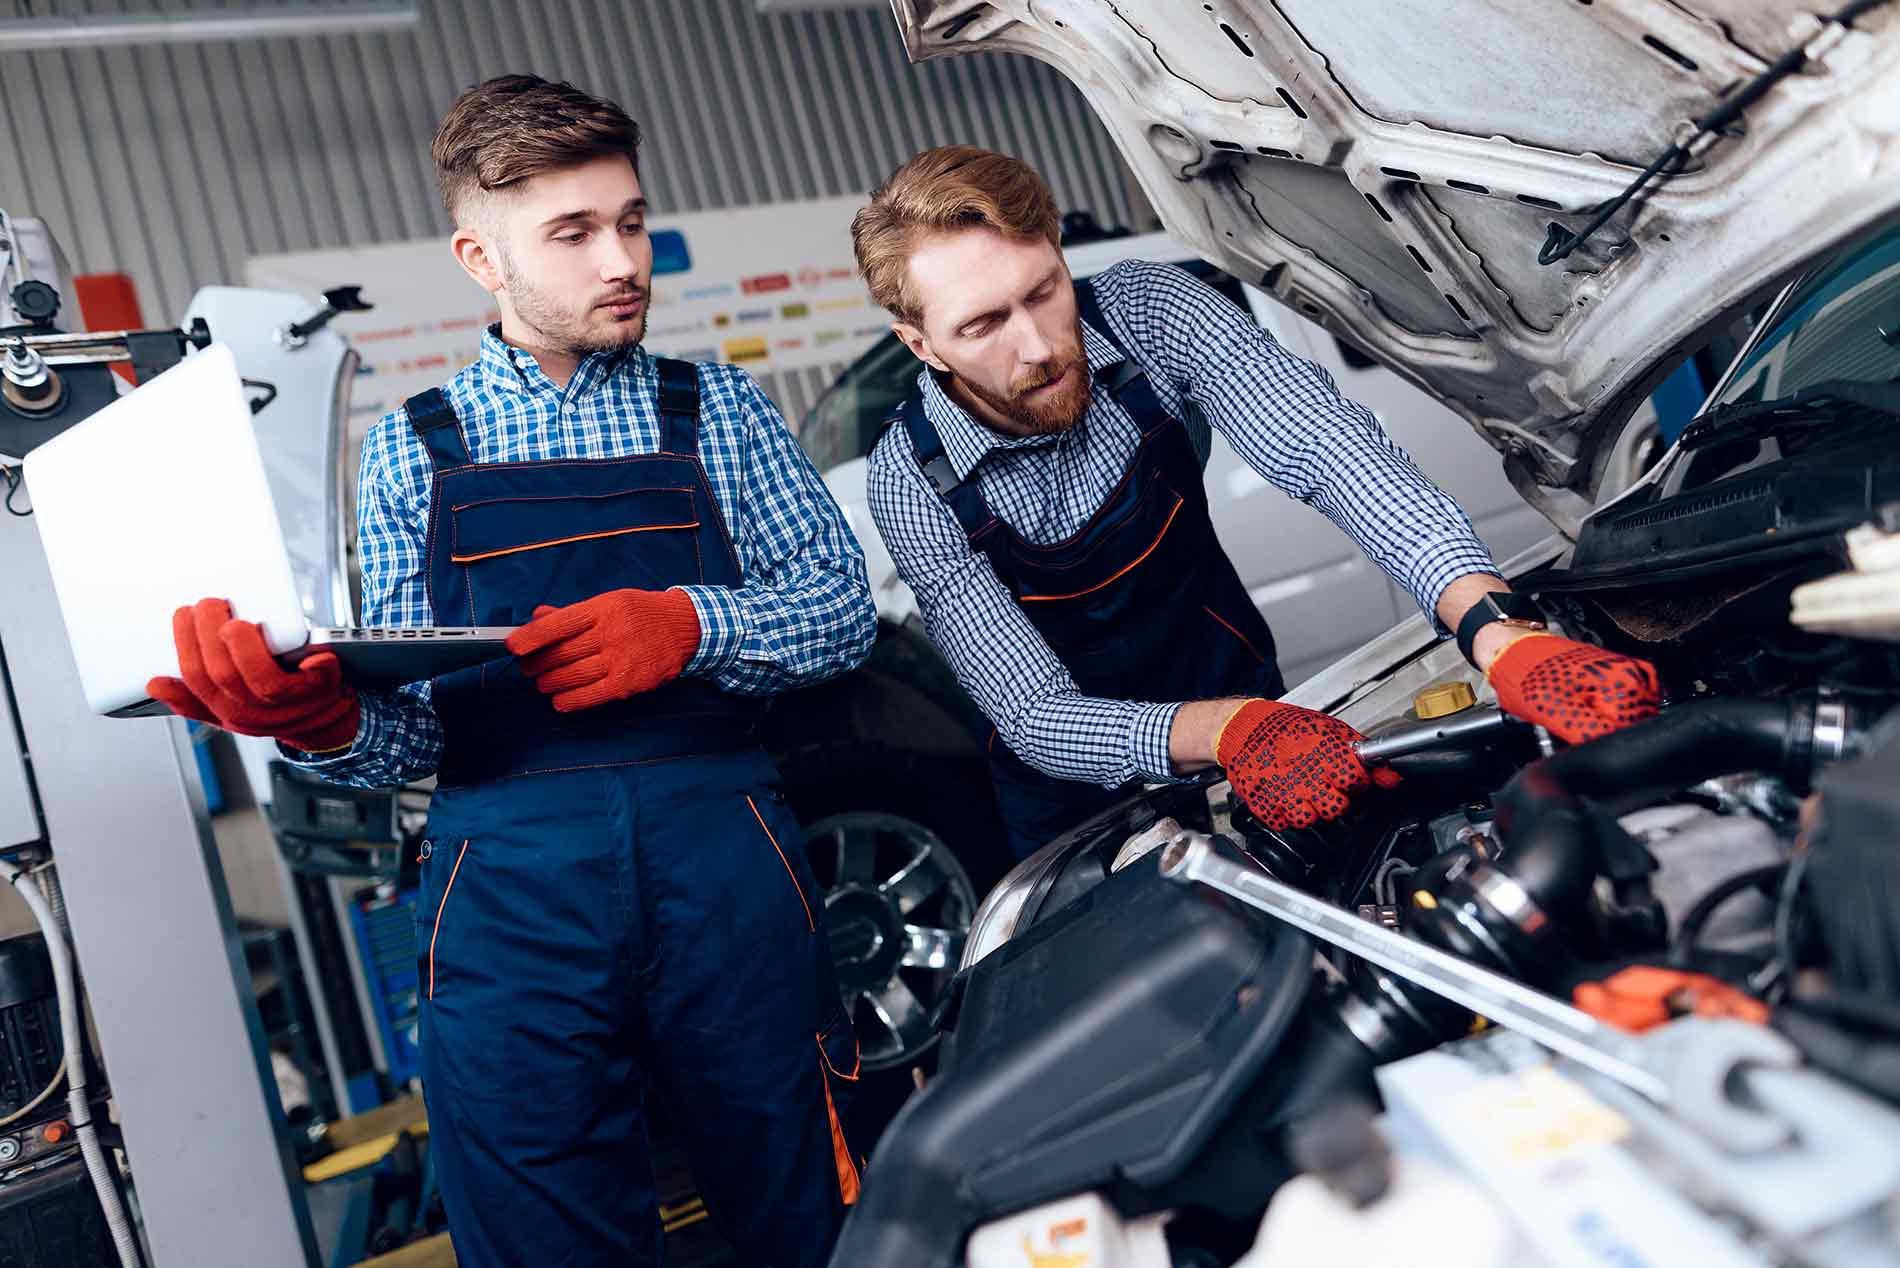 Automotive repair program to consider